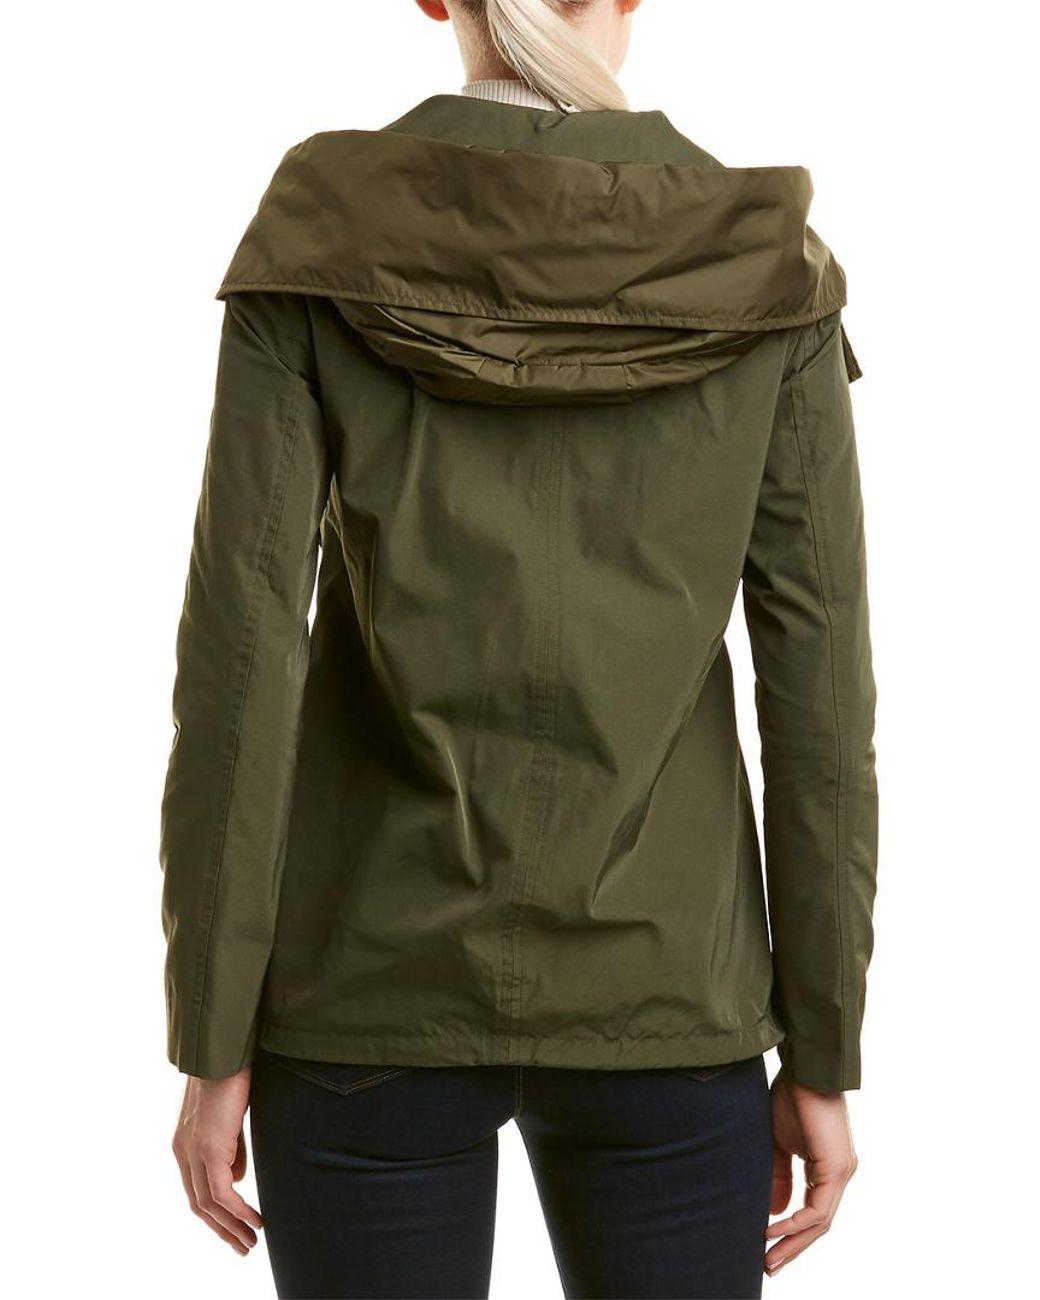 730290184 Women's Green Audrey Jacket